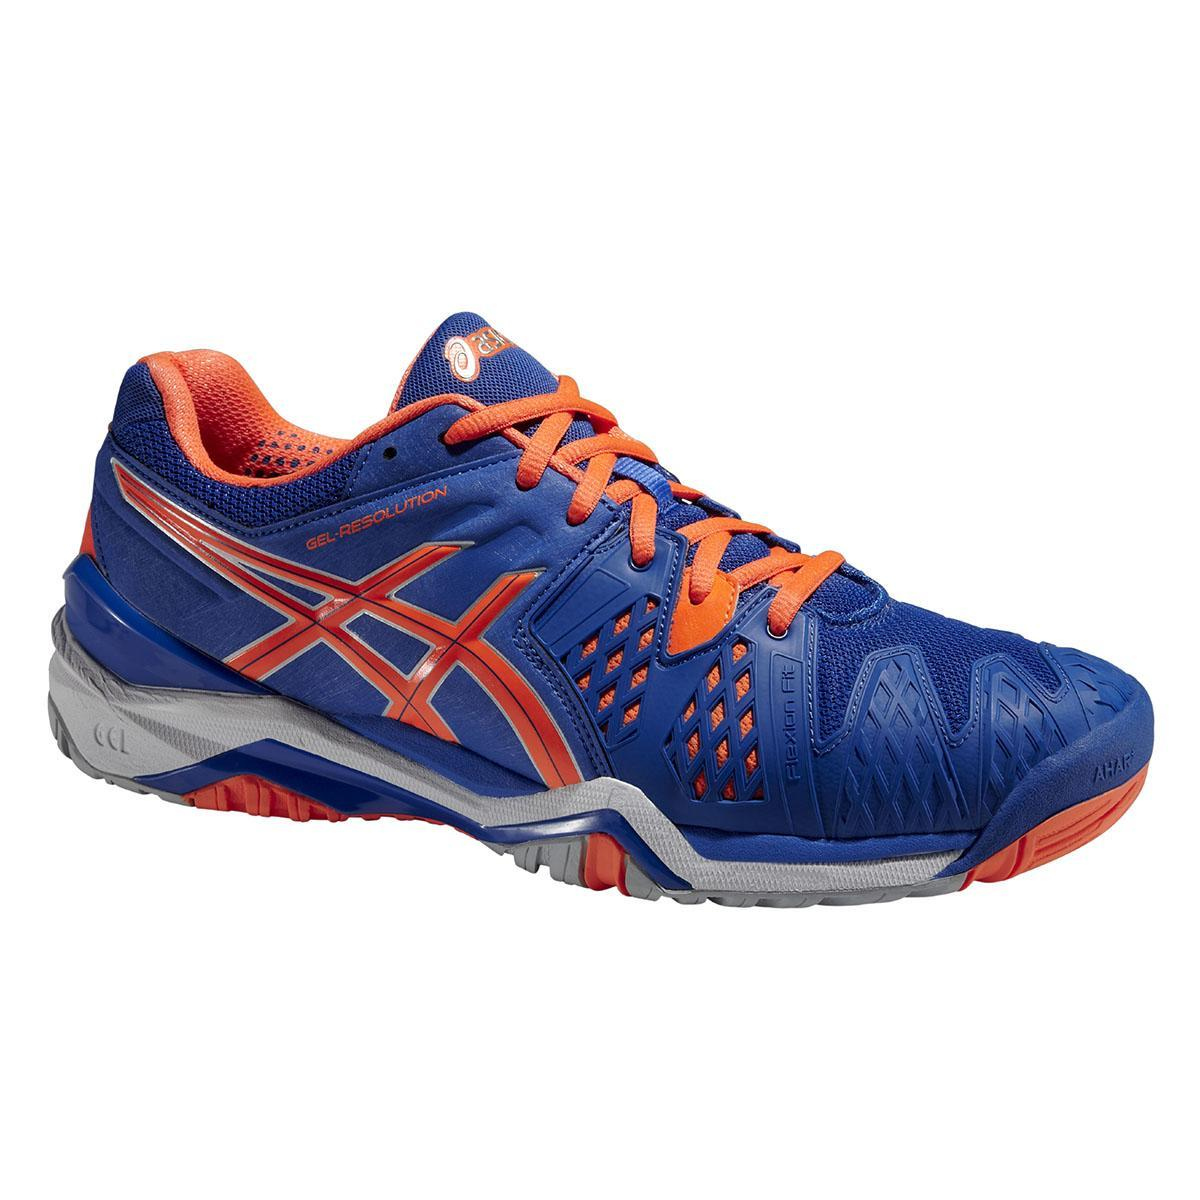 Asics Mens GEL Resolution 6 Tennis Shoes - Blue Flash Orange Silver ... 171e0826fb4c2